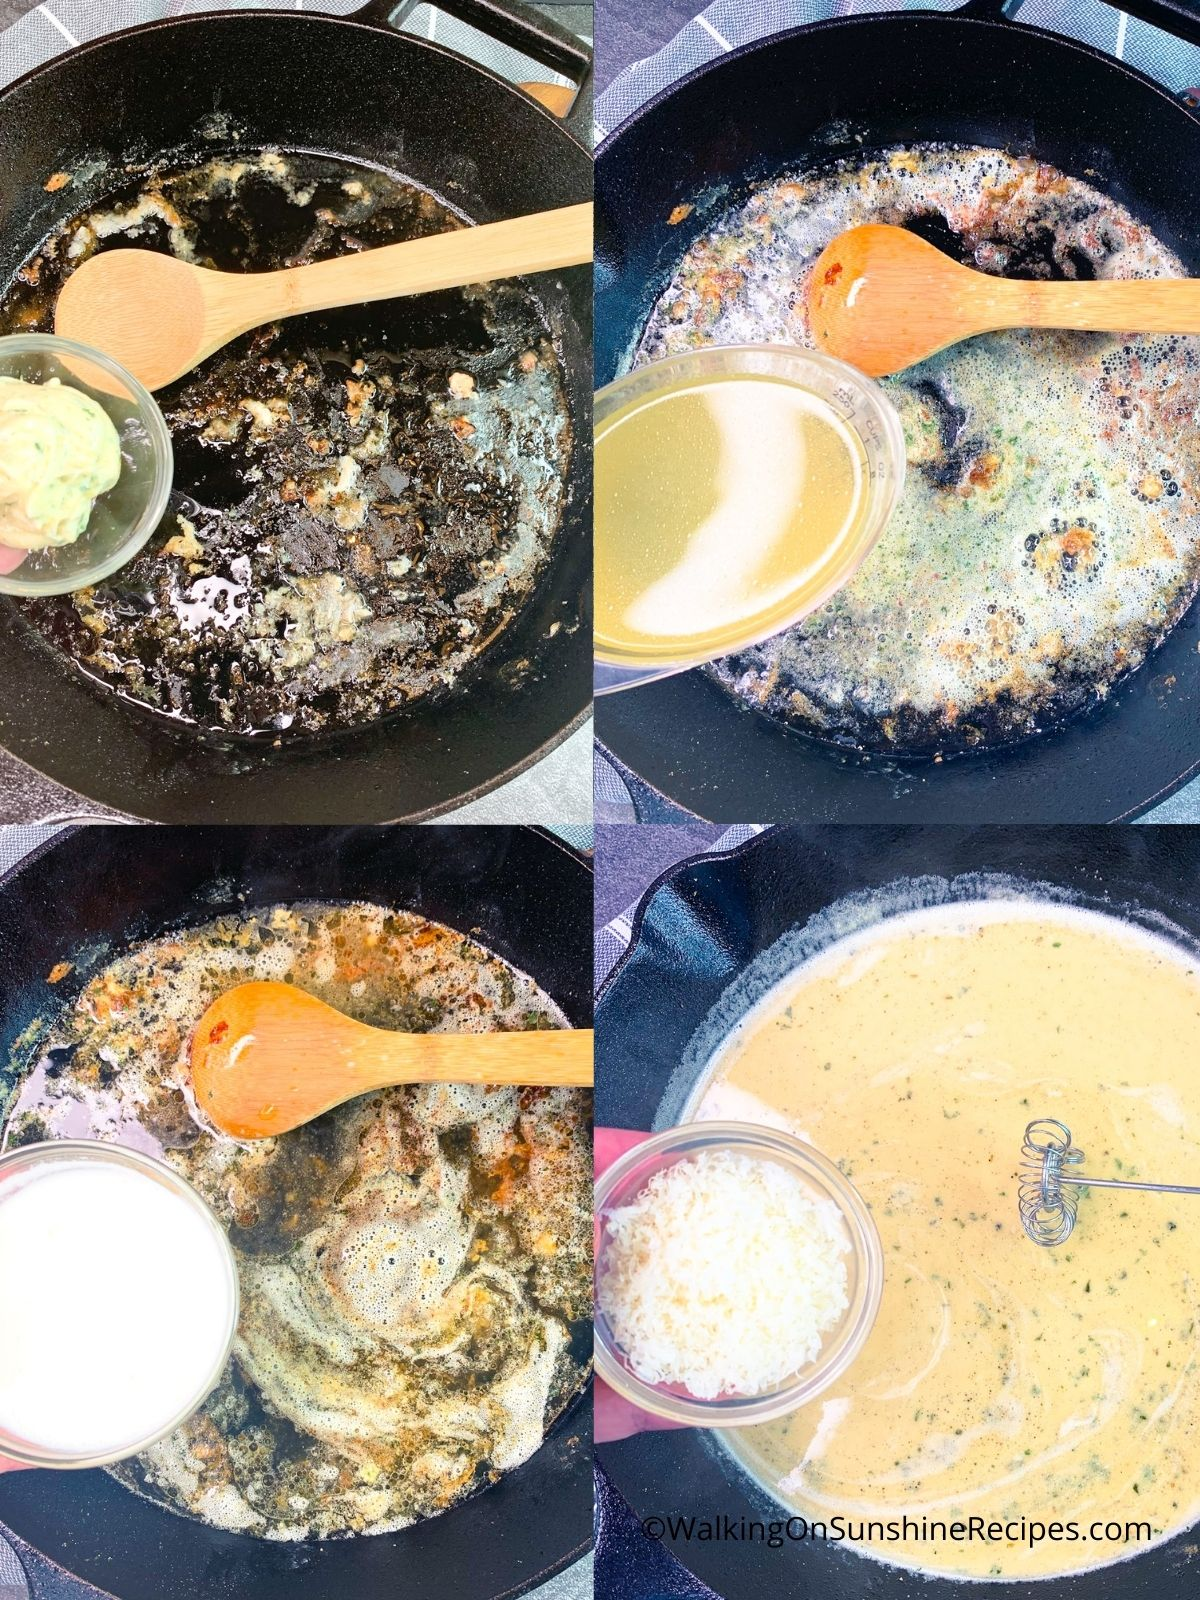 Make homemade garlic butter sauce in cast iron skillet.